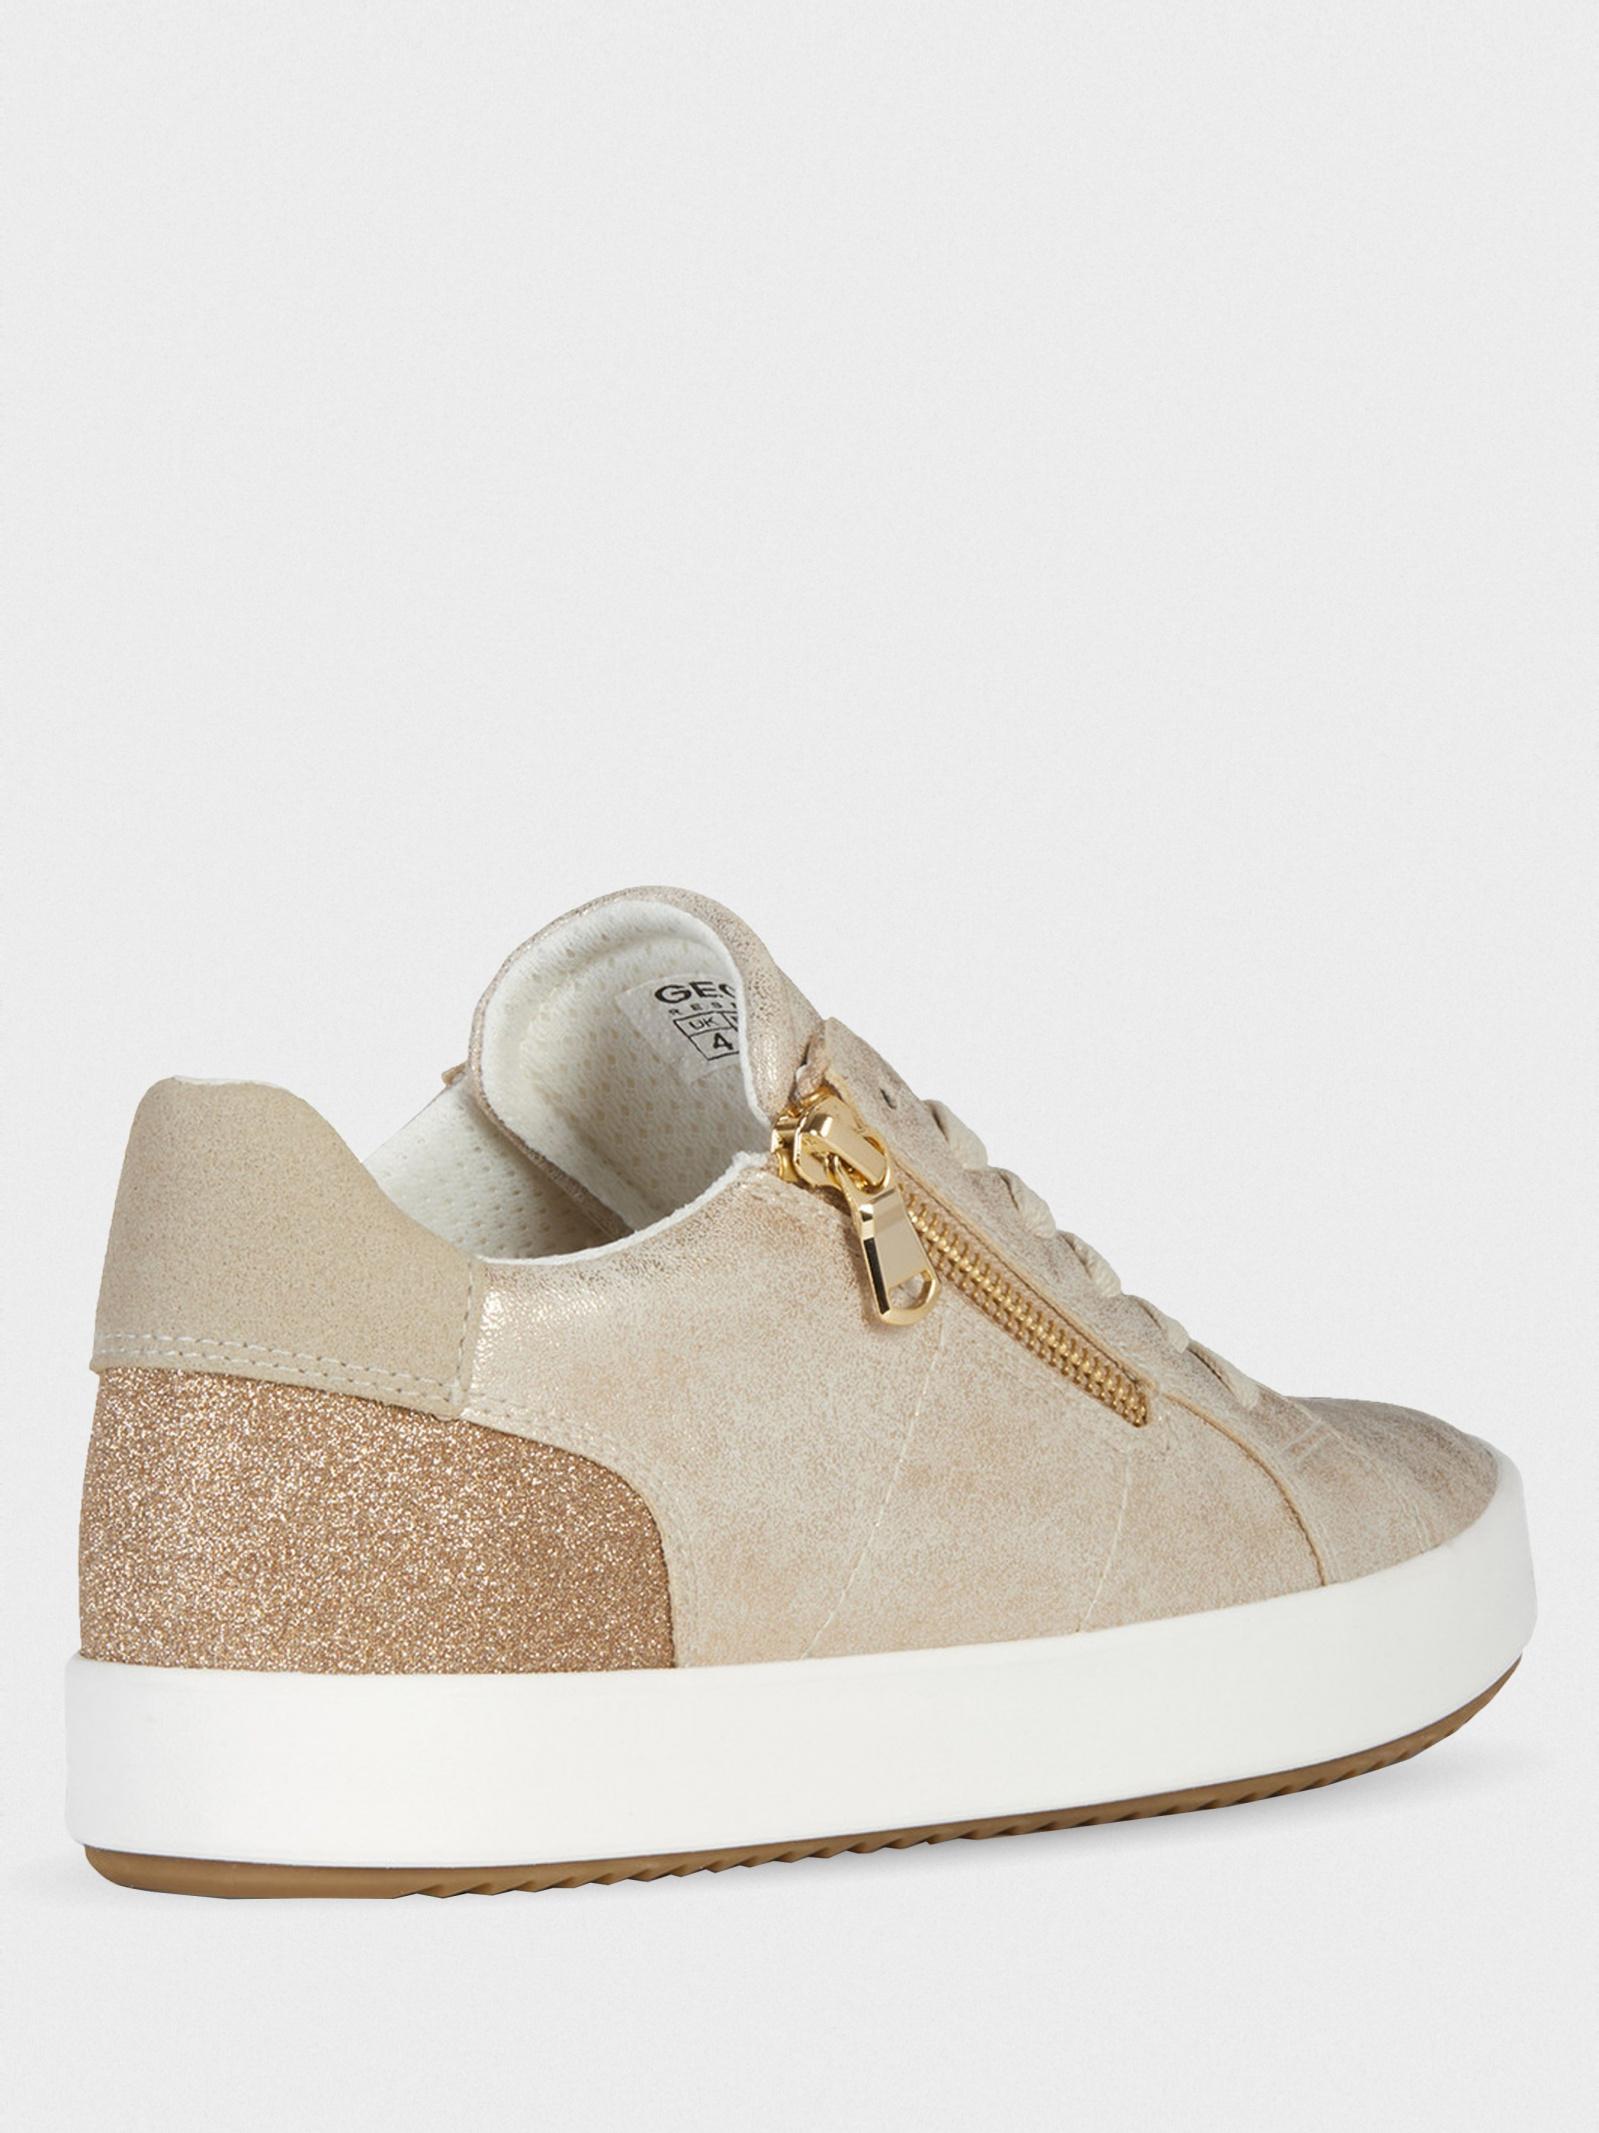 Полуботинки женские Geox D BLOMIEE XW3787 размеры обуви, 2017